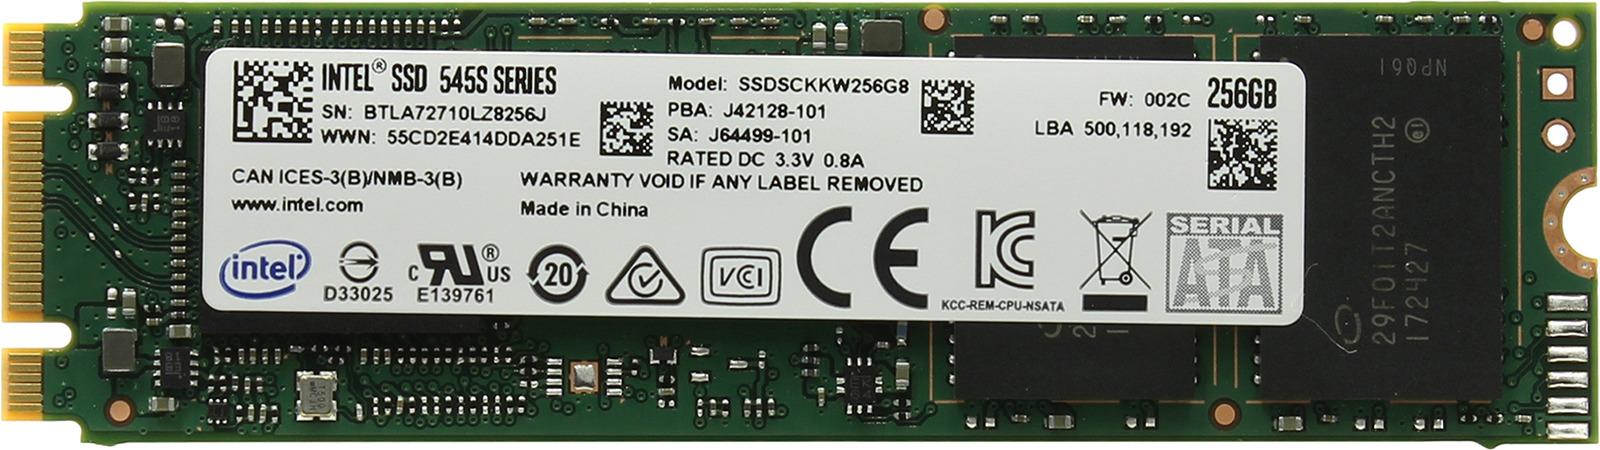 SSD накопитель Intel 545s Series Original 256GB, SSDSCKKW256G8X1 958687 цена и фото